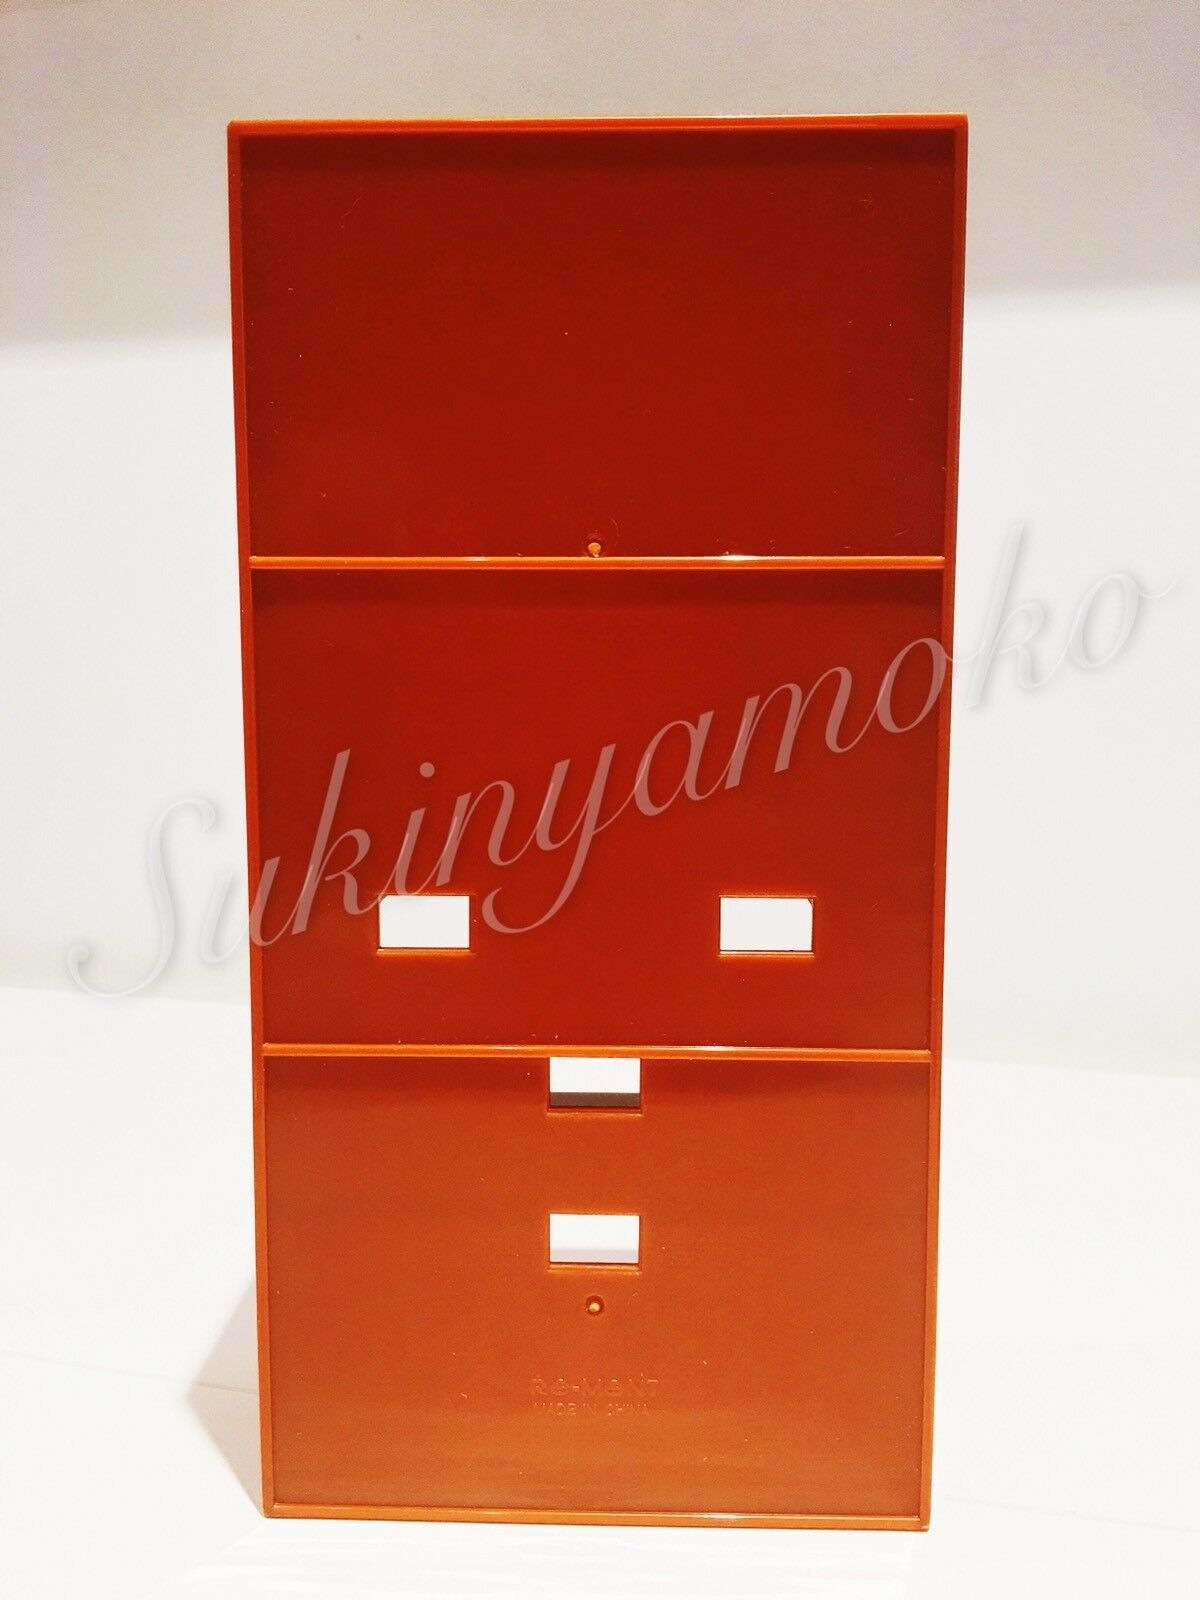 Petit Sample Series Cabinet Display     Petit Your Kitchen Cupboard (grain)  9c1b5d